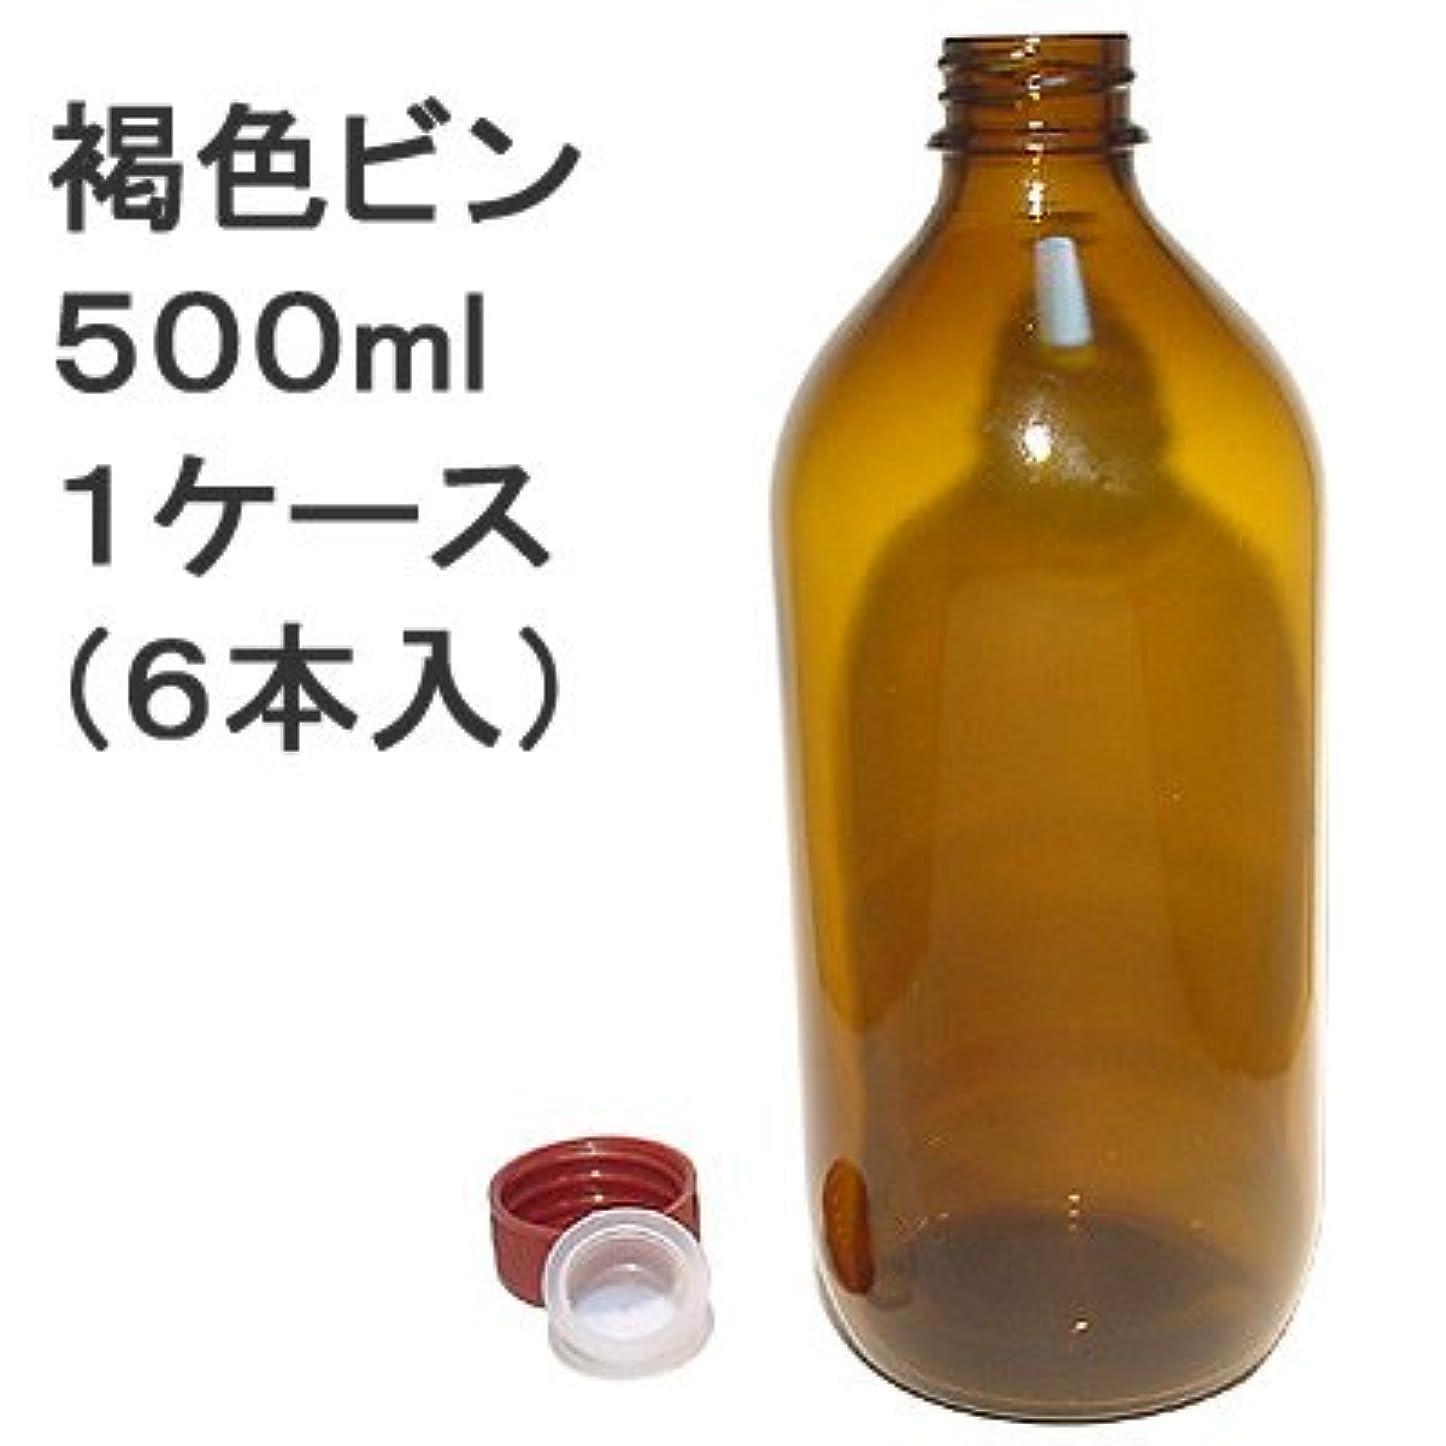 接地群れ鰐遮光瓶(中栓付) 褐色 500ml 1ケース(6本入)